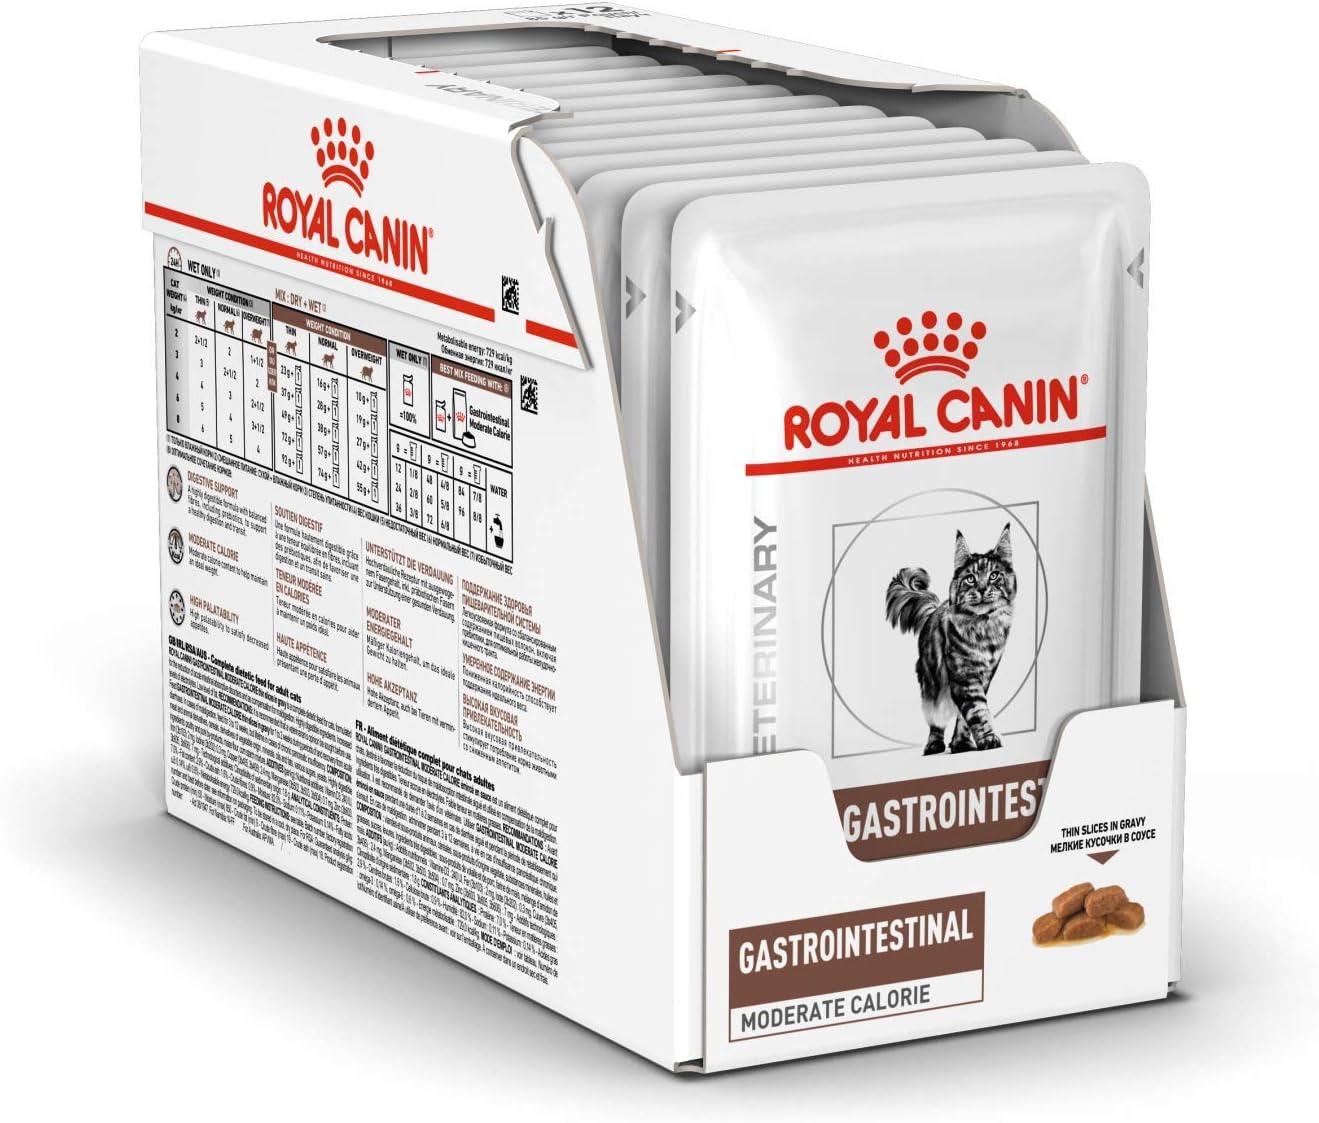 Royal Canin Gastro Intestinal, Alimento Húmedo para Gato, Pack de 12 x 100 g: Amazon.es: Productos para mascotas